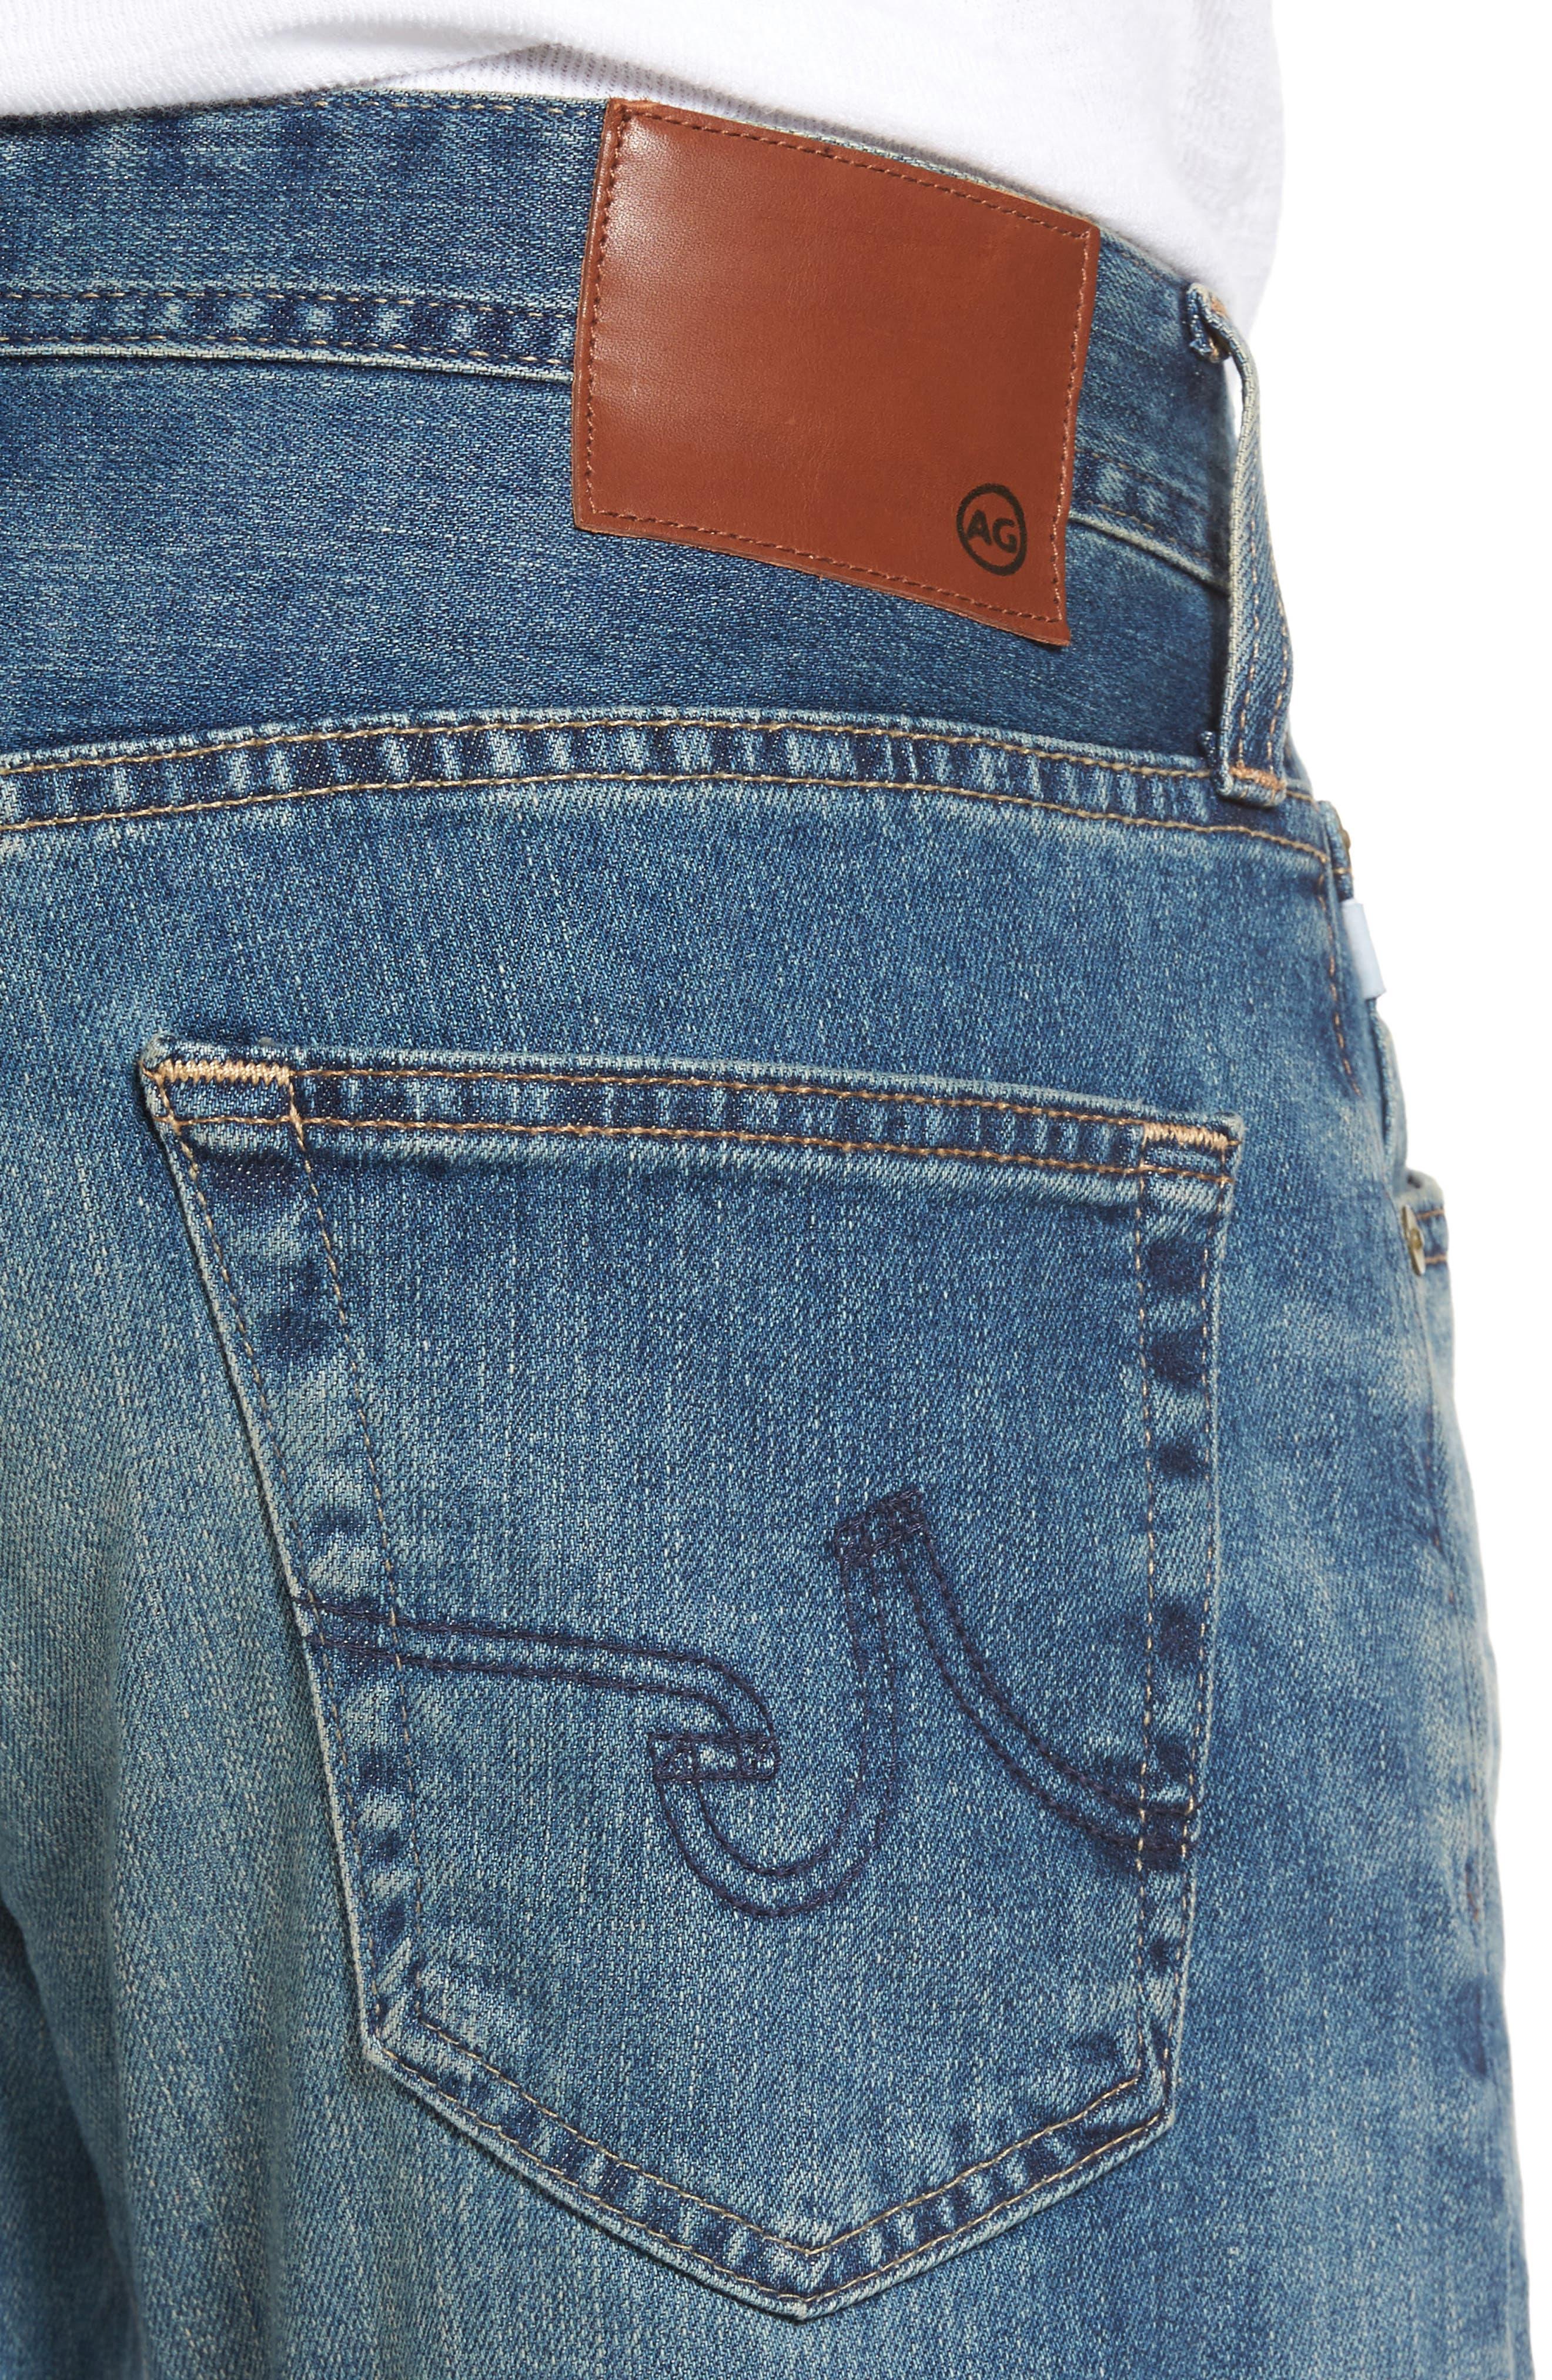 Graduate Slim Straight Leg Jeans,                             Alternate thumbnail 4, color,                             430